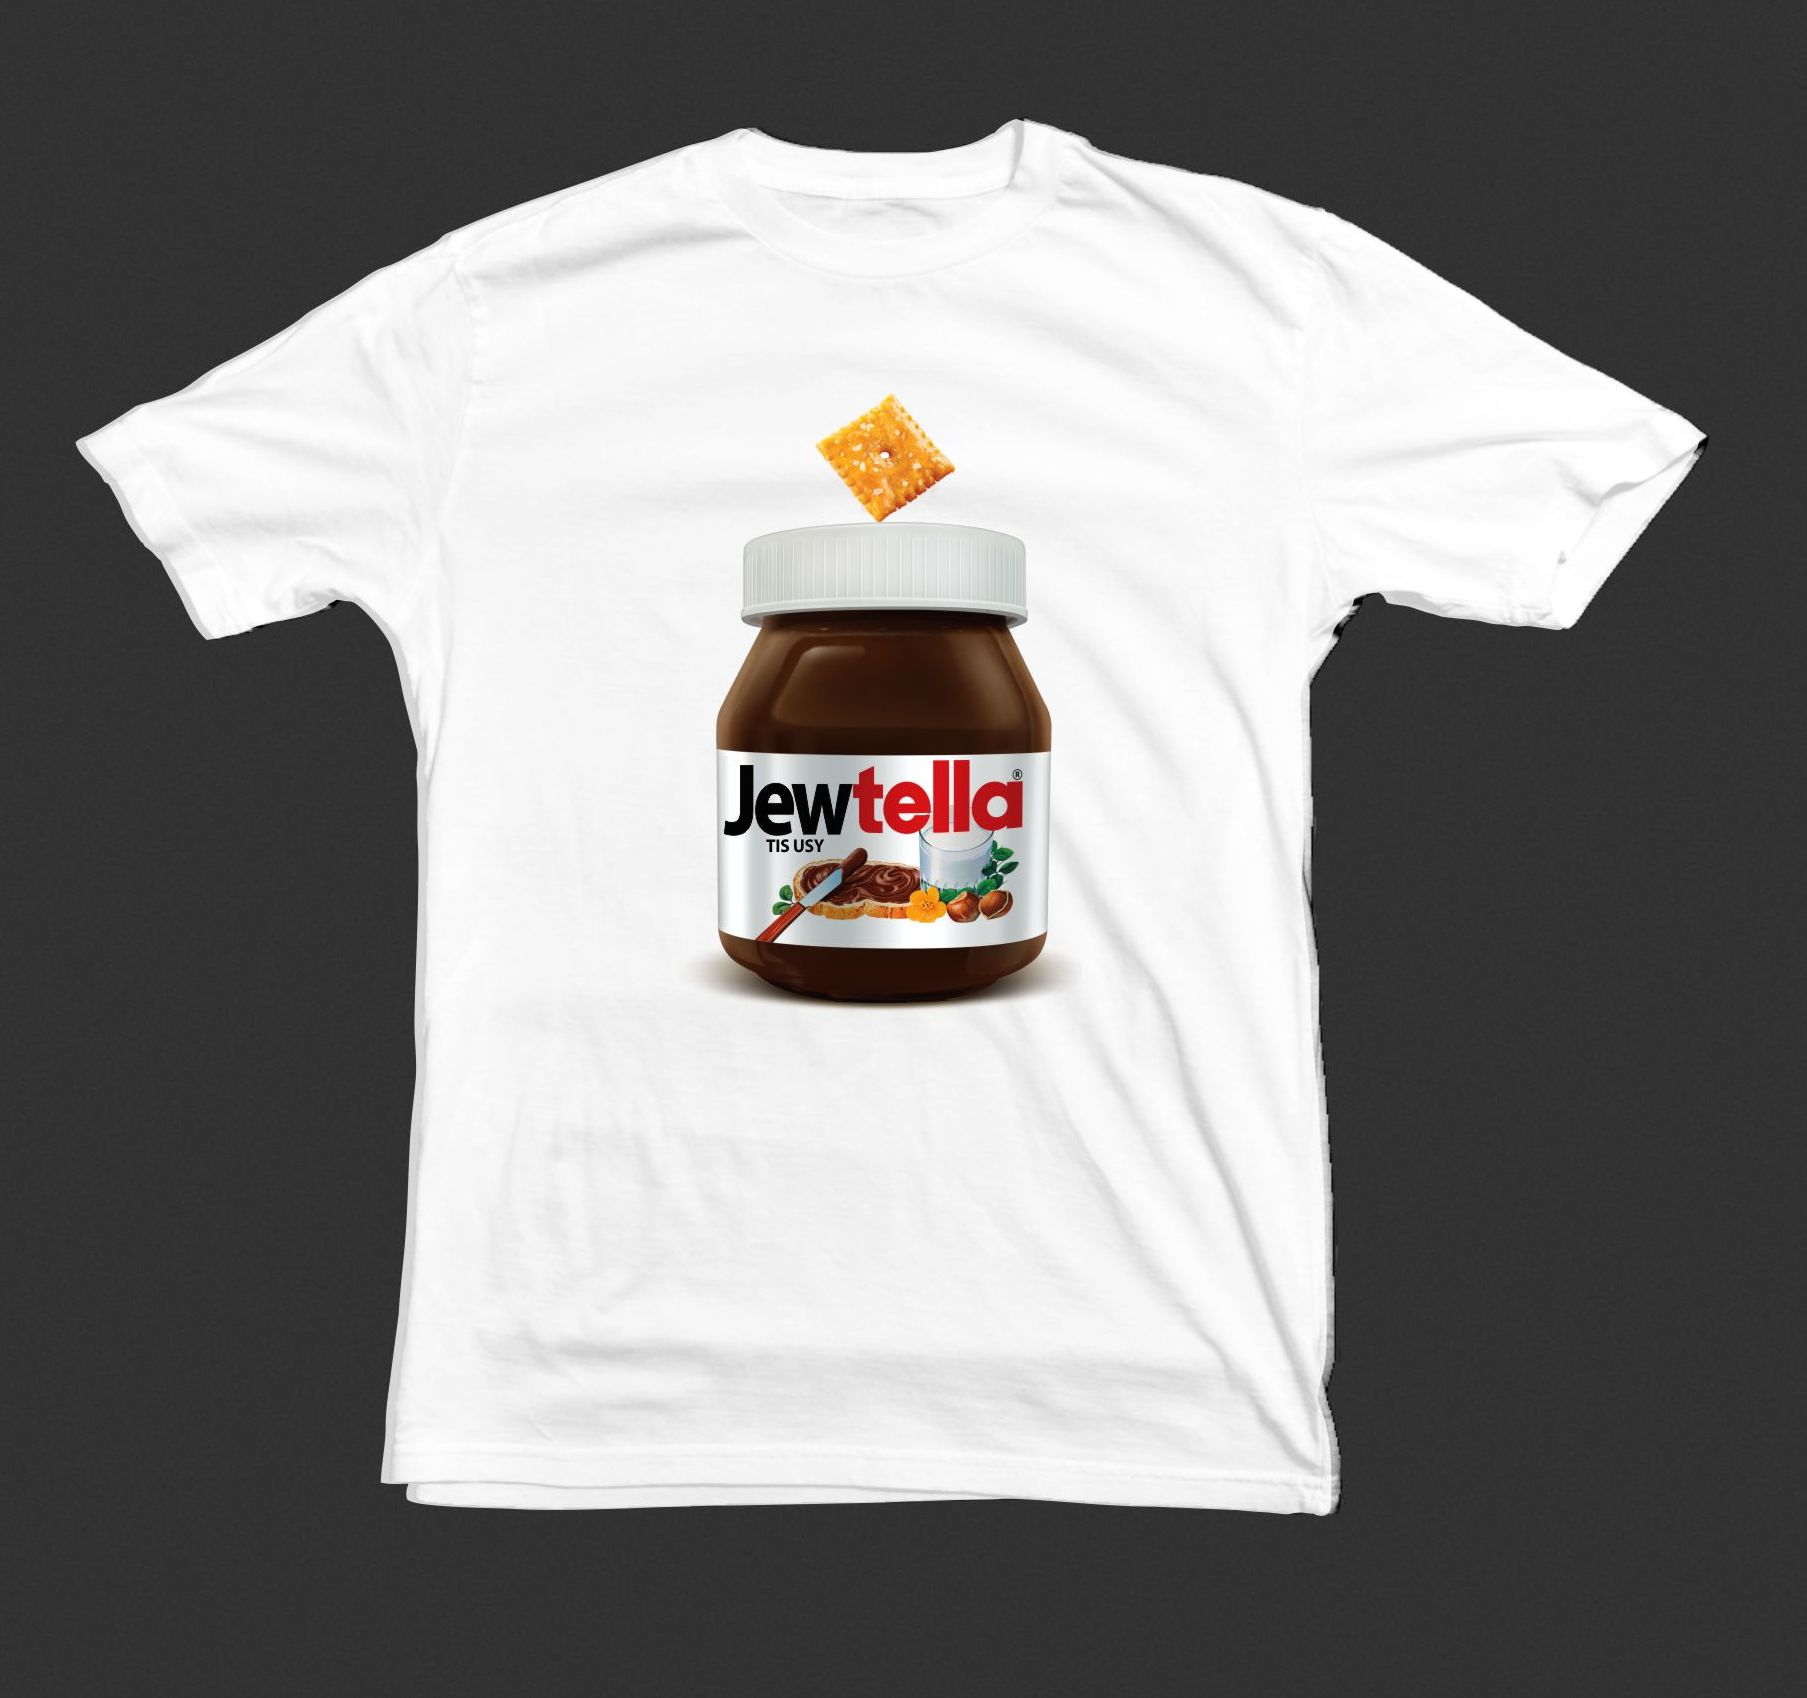 Jewtella